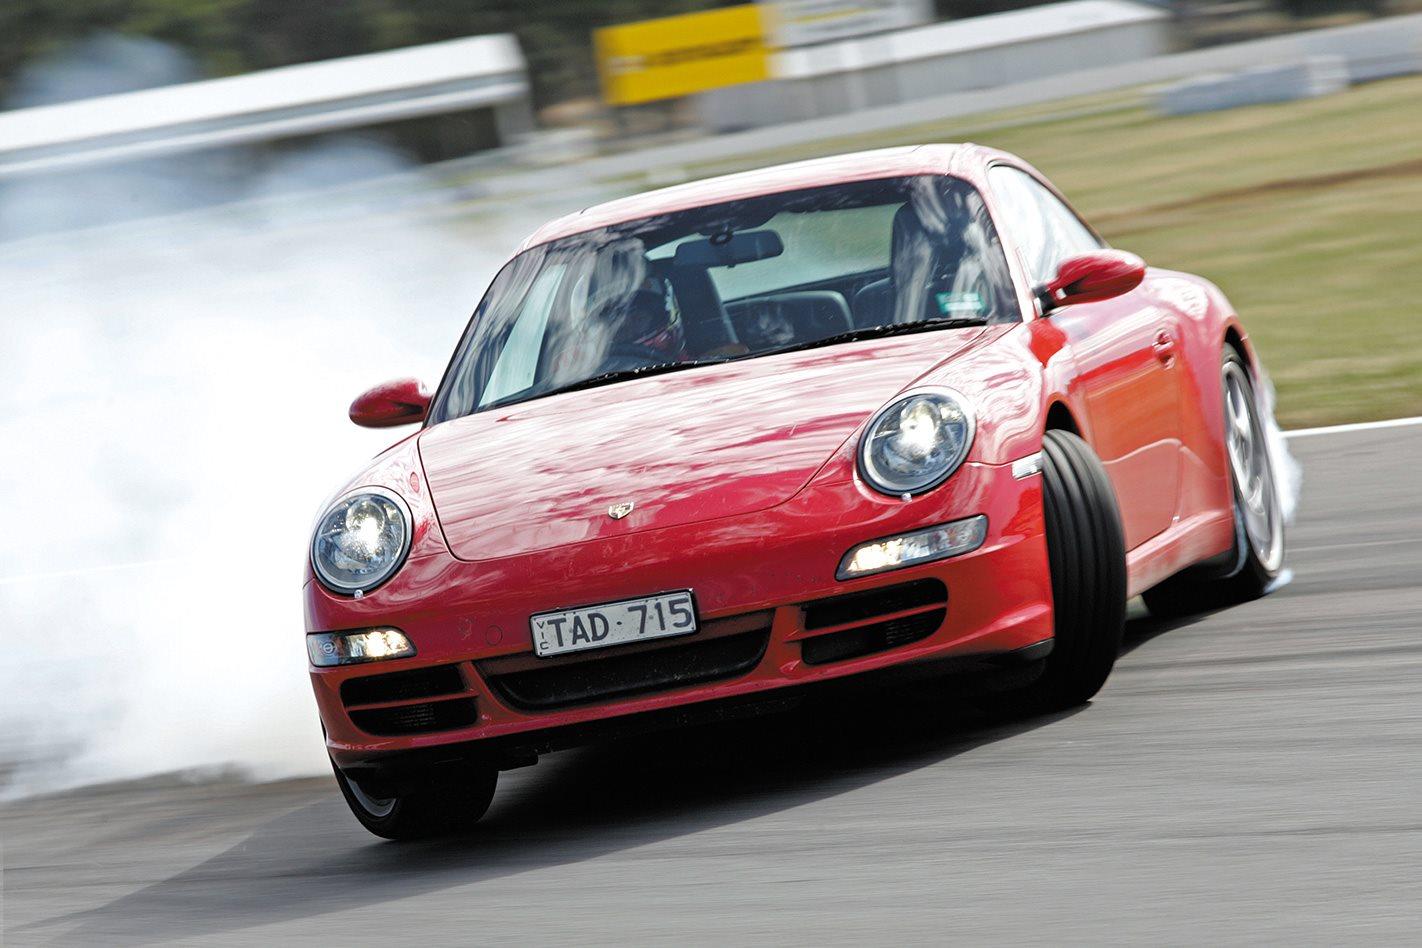 2005-Porsche-911-Carrera-S.jpg